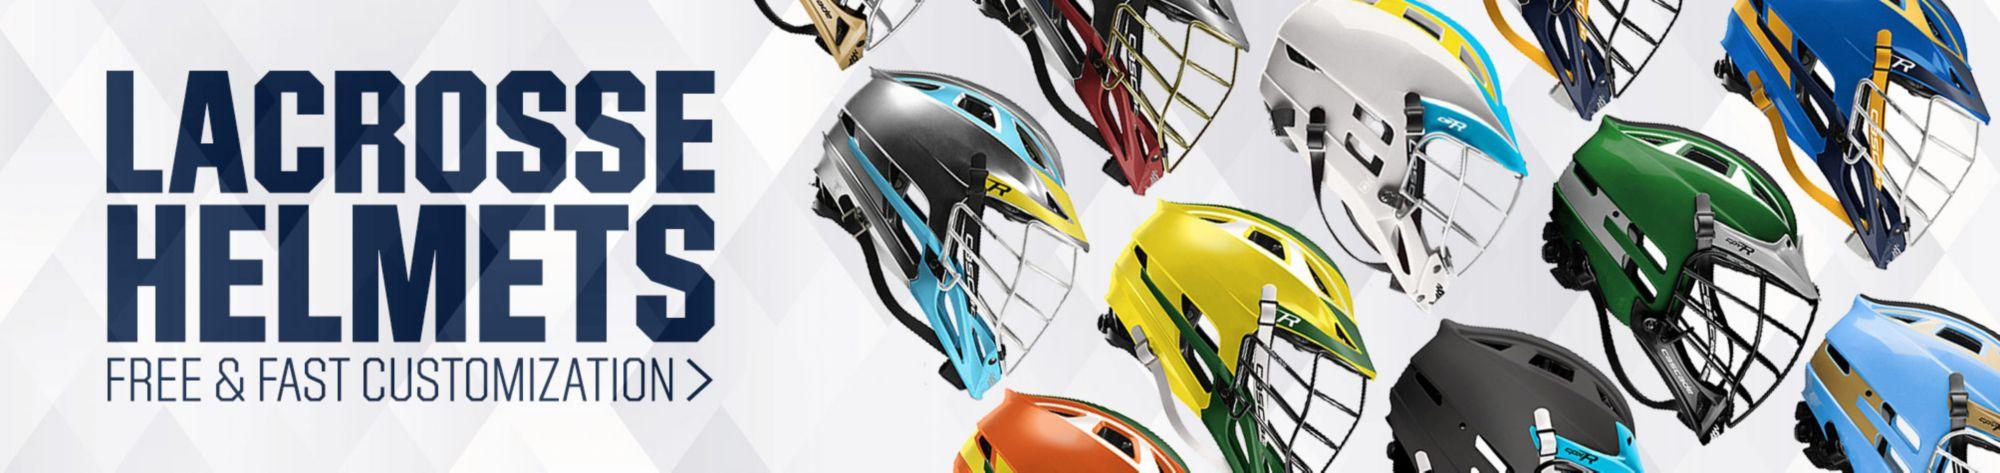 Shop Custom Lacrosse Helmets